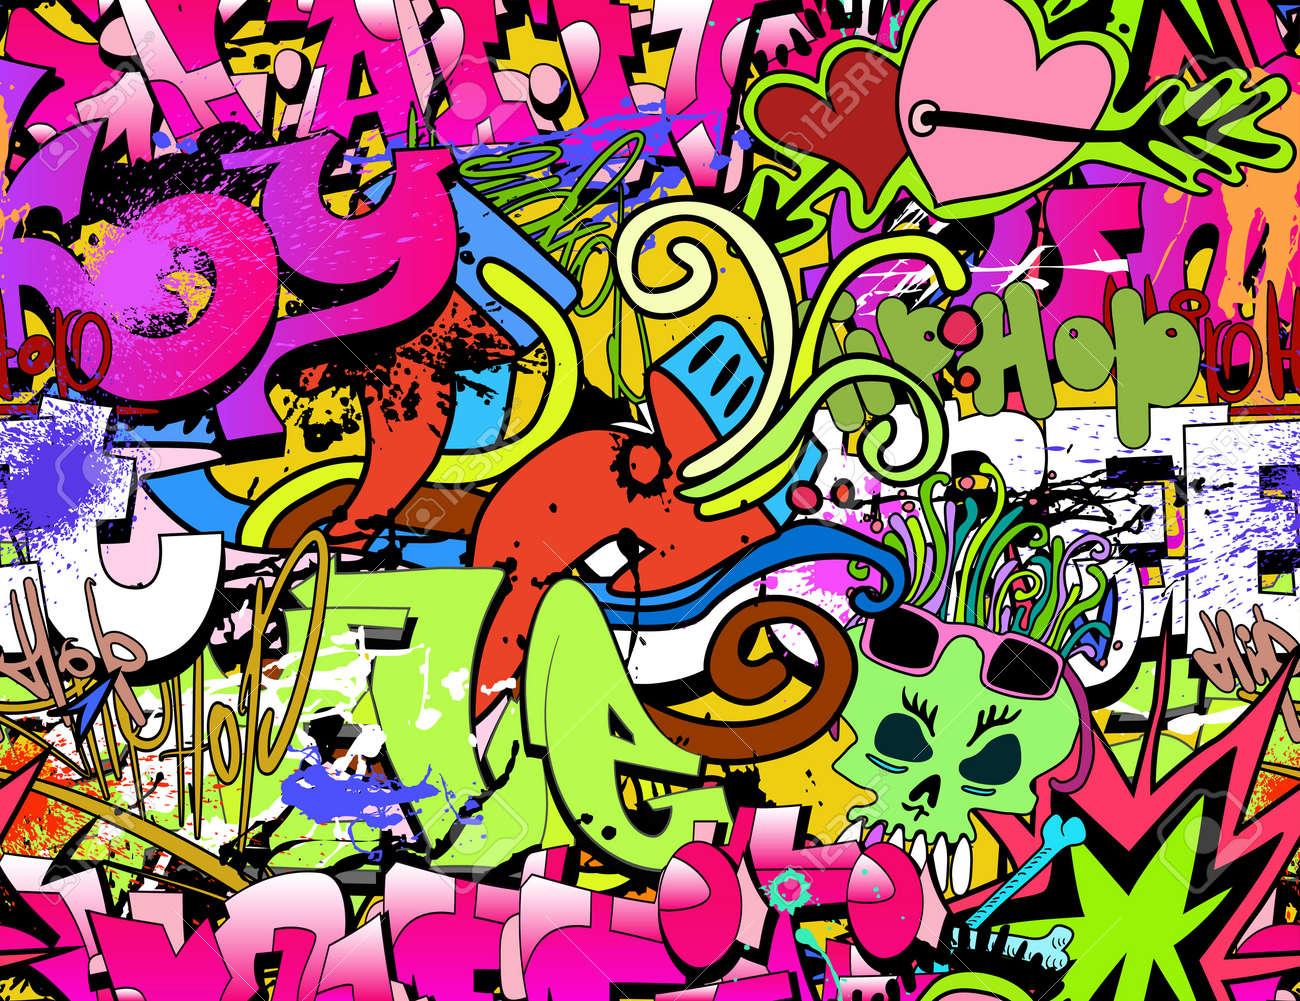 Graffiti art background - Graffiti Background Graffiti Wall Art Background Hip Hop Style Seamless Texture Pattern Illustration